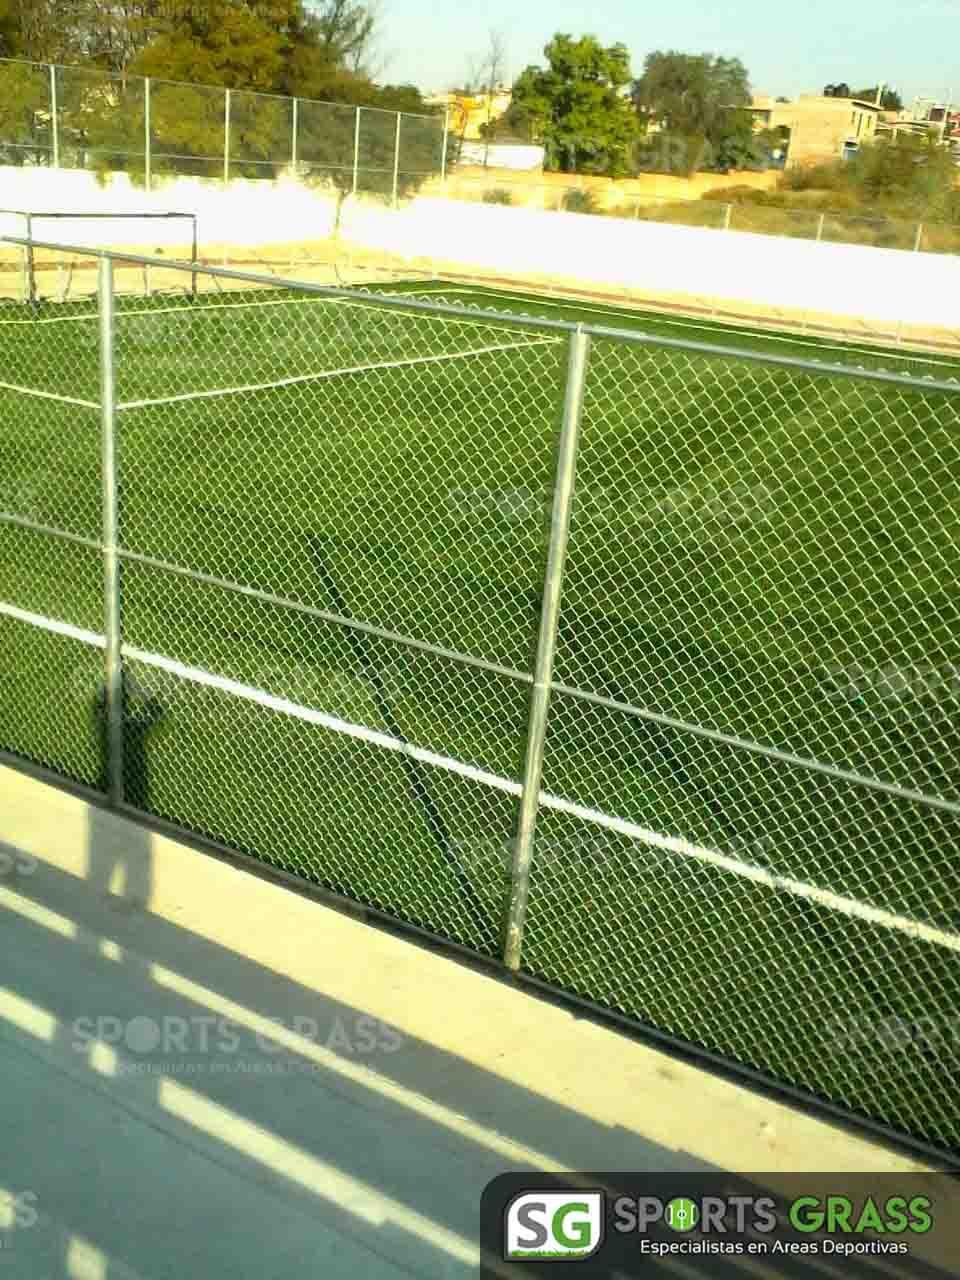 Cancha Futbol 7 Apaseo el Alto Guanajuato Sports Grass 10